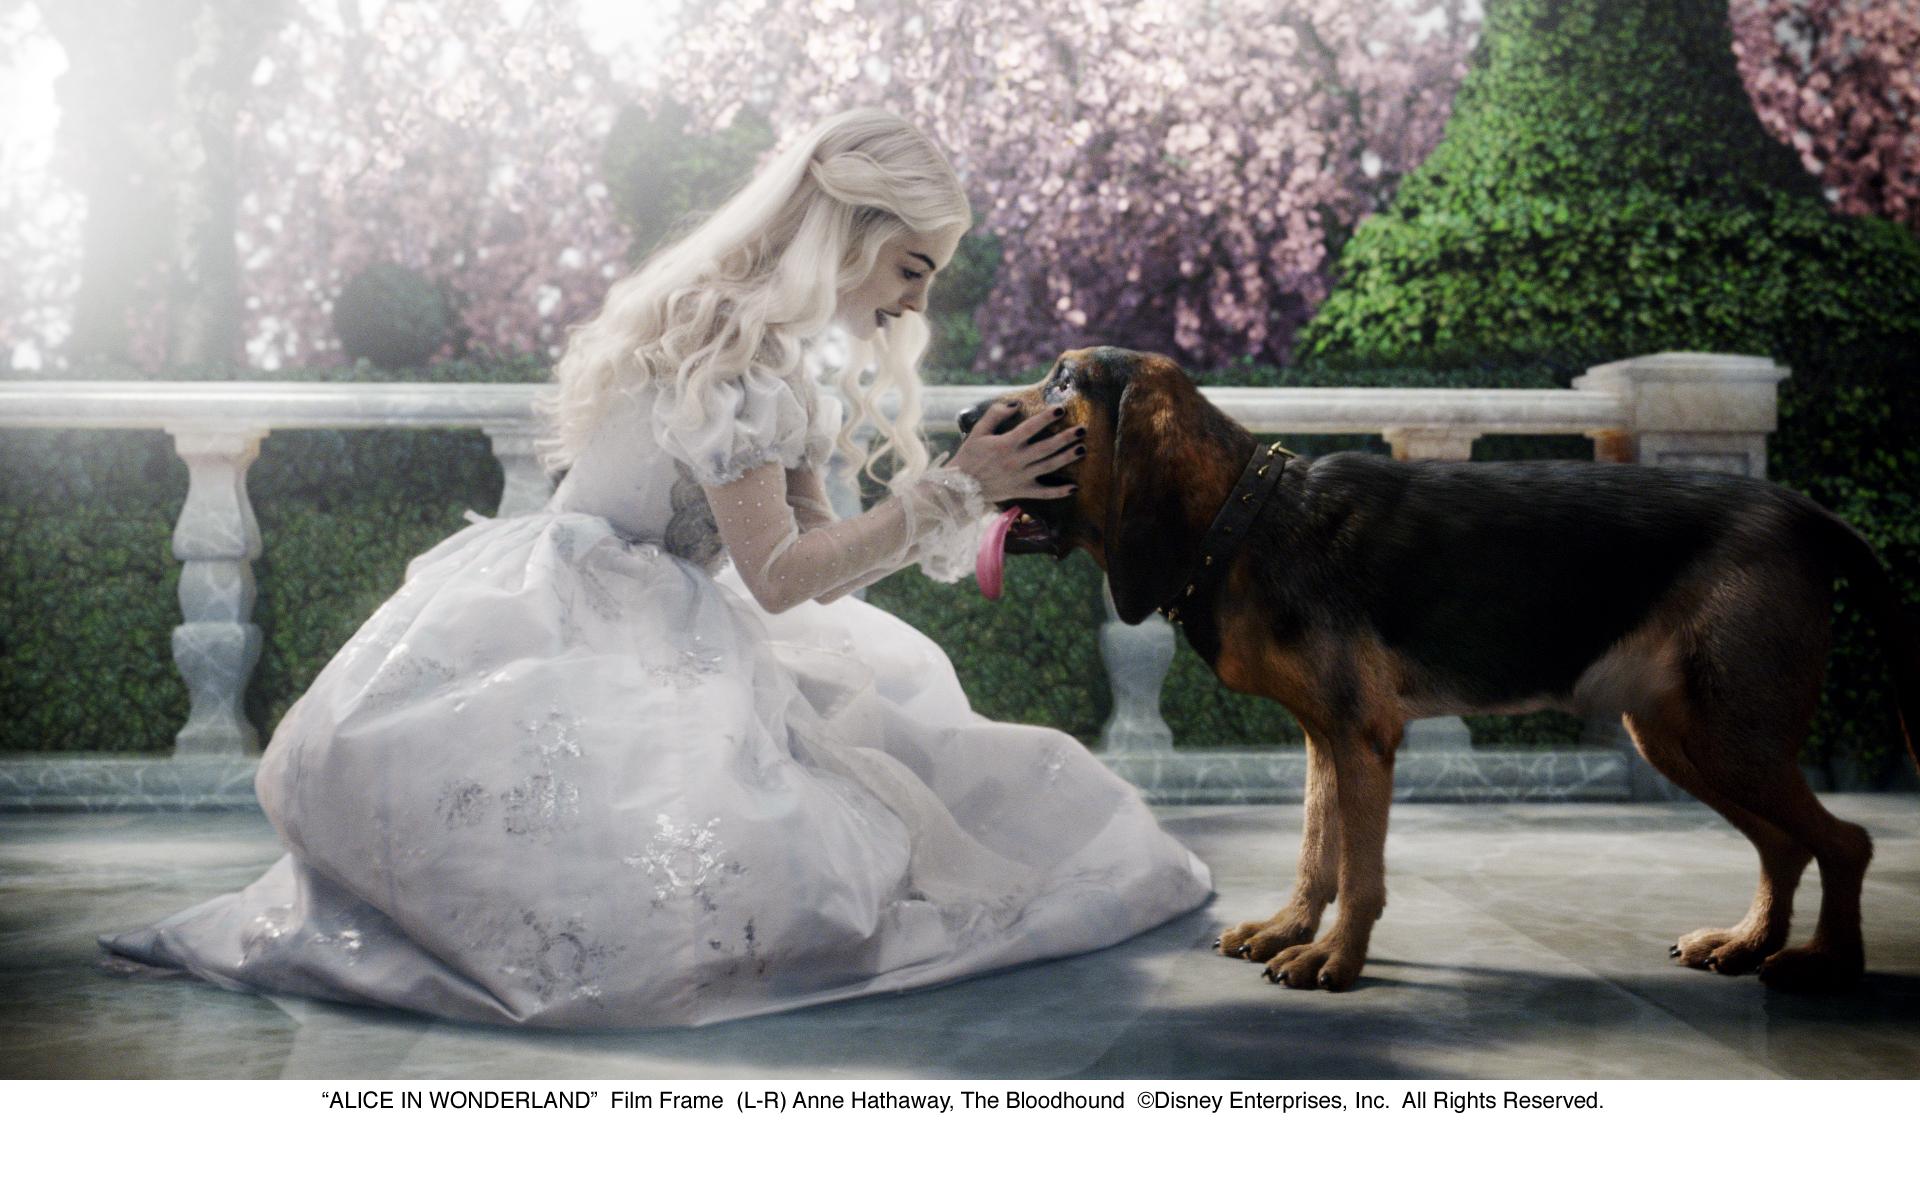 http://www.collider.com/wp-content/uploads/alice-in-wonderland-movie-image-7.jpg